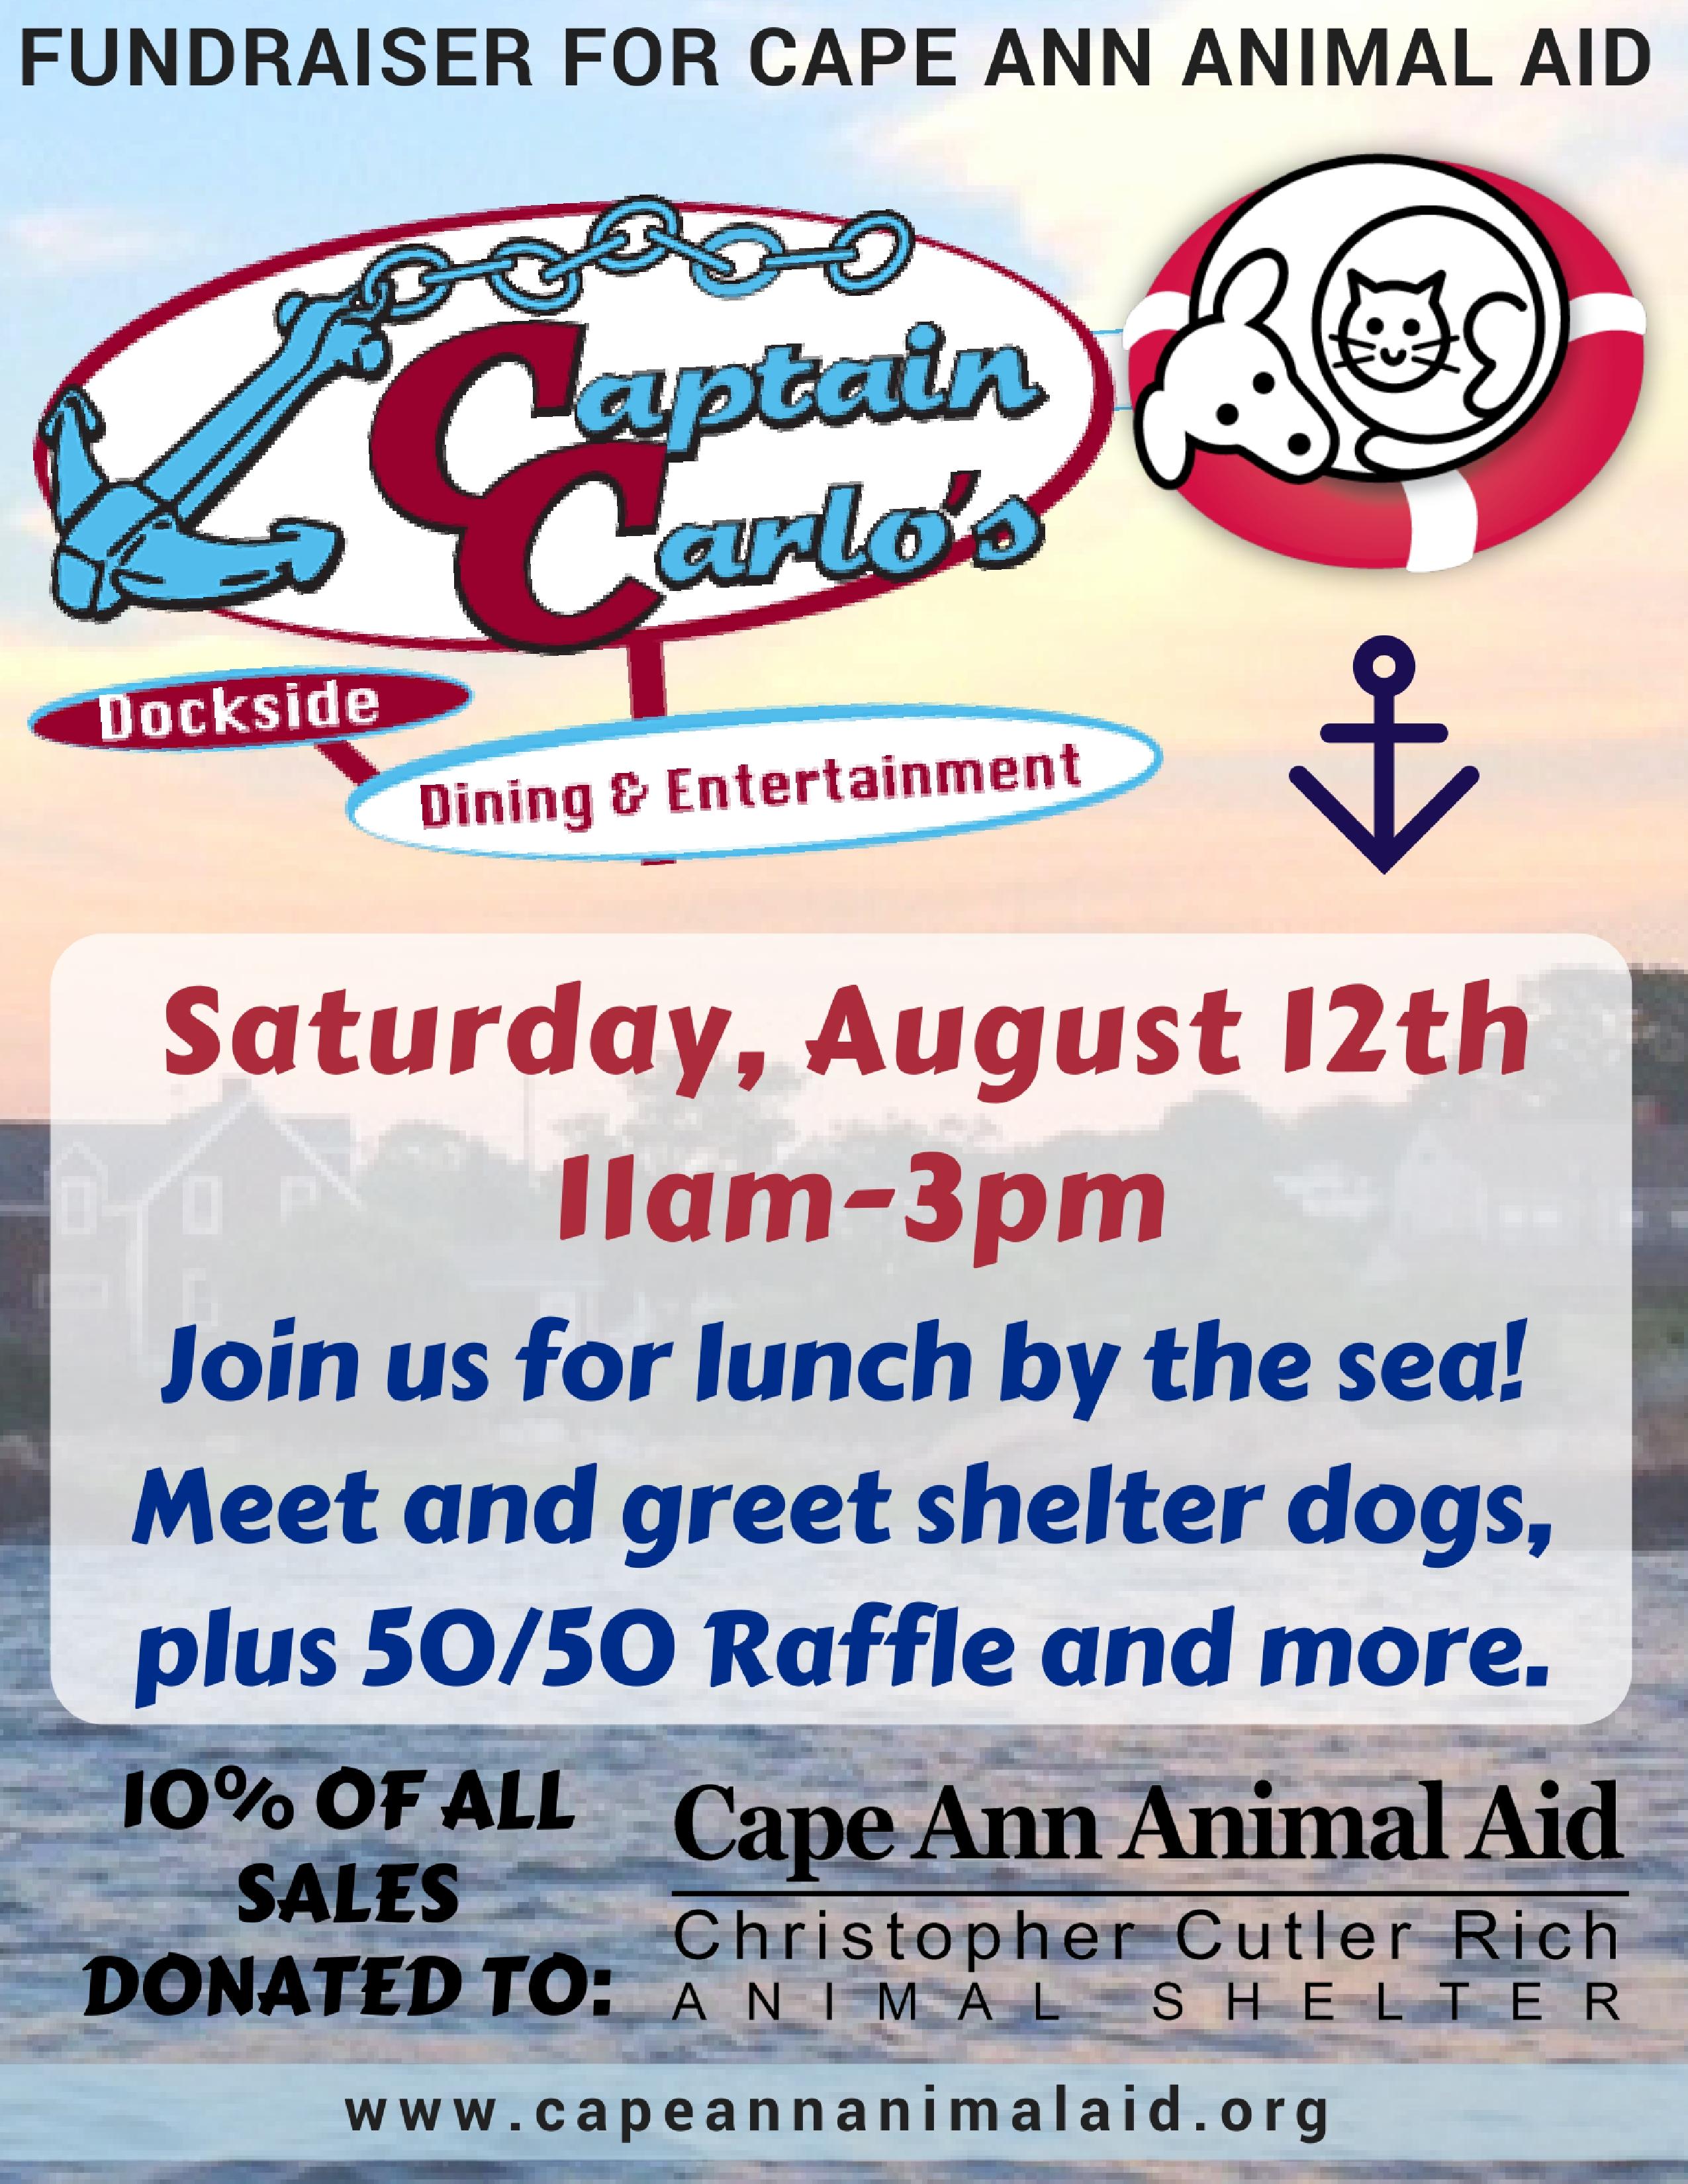 captain carlos fundraiser